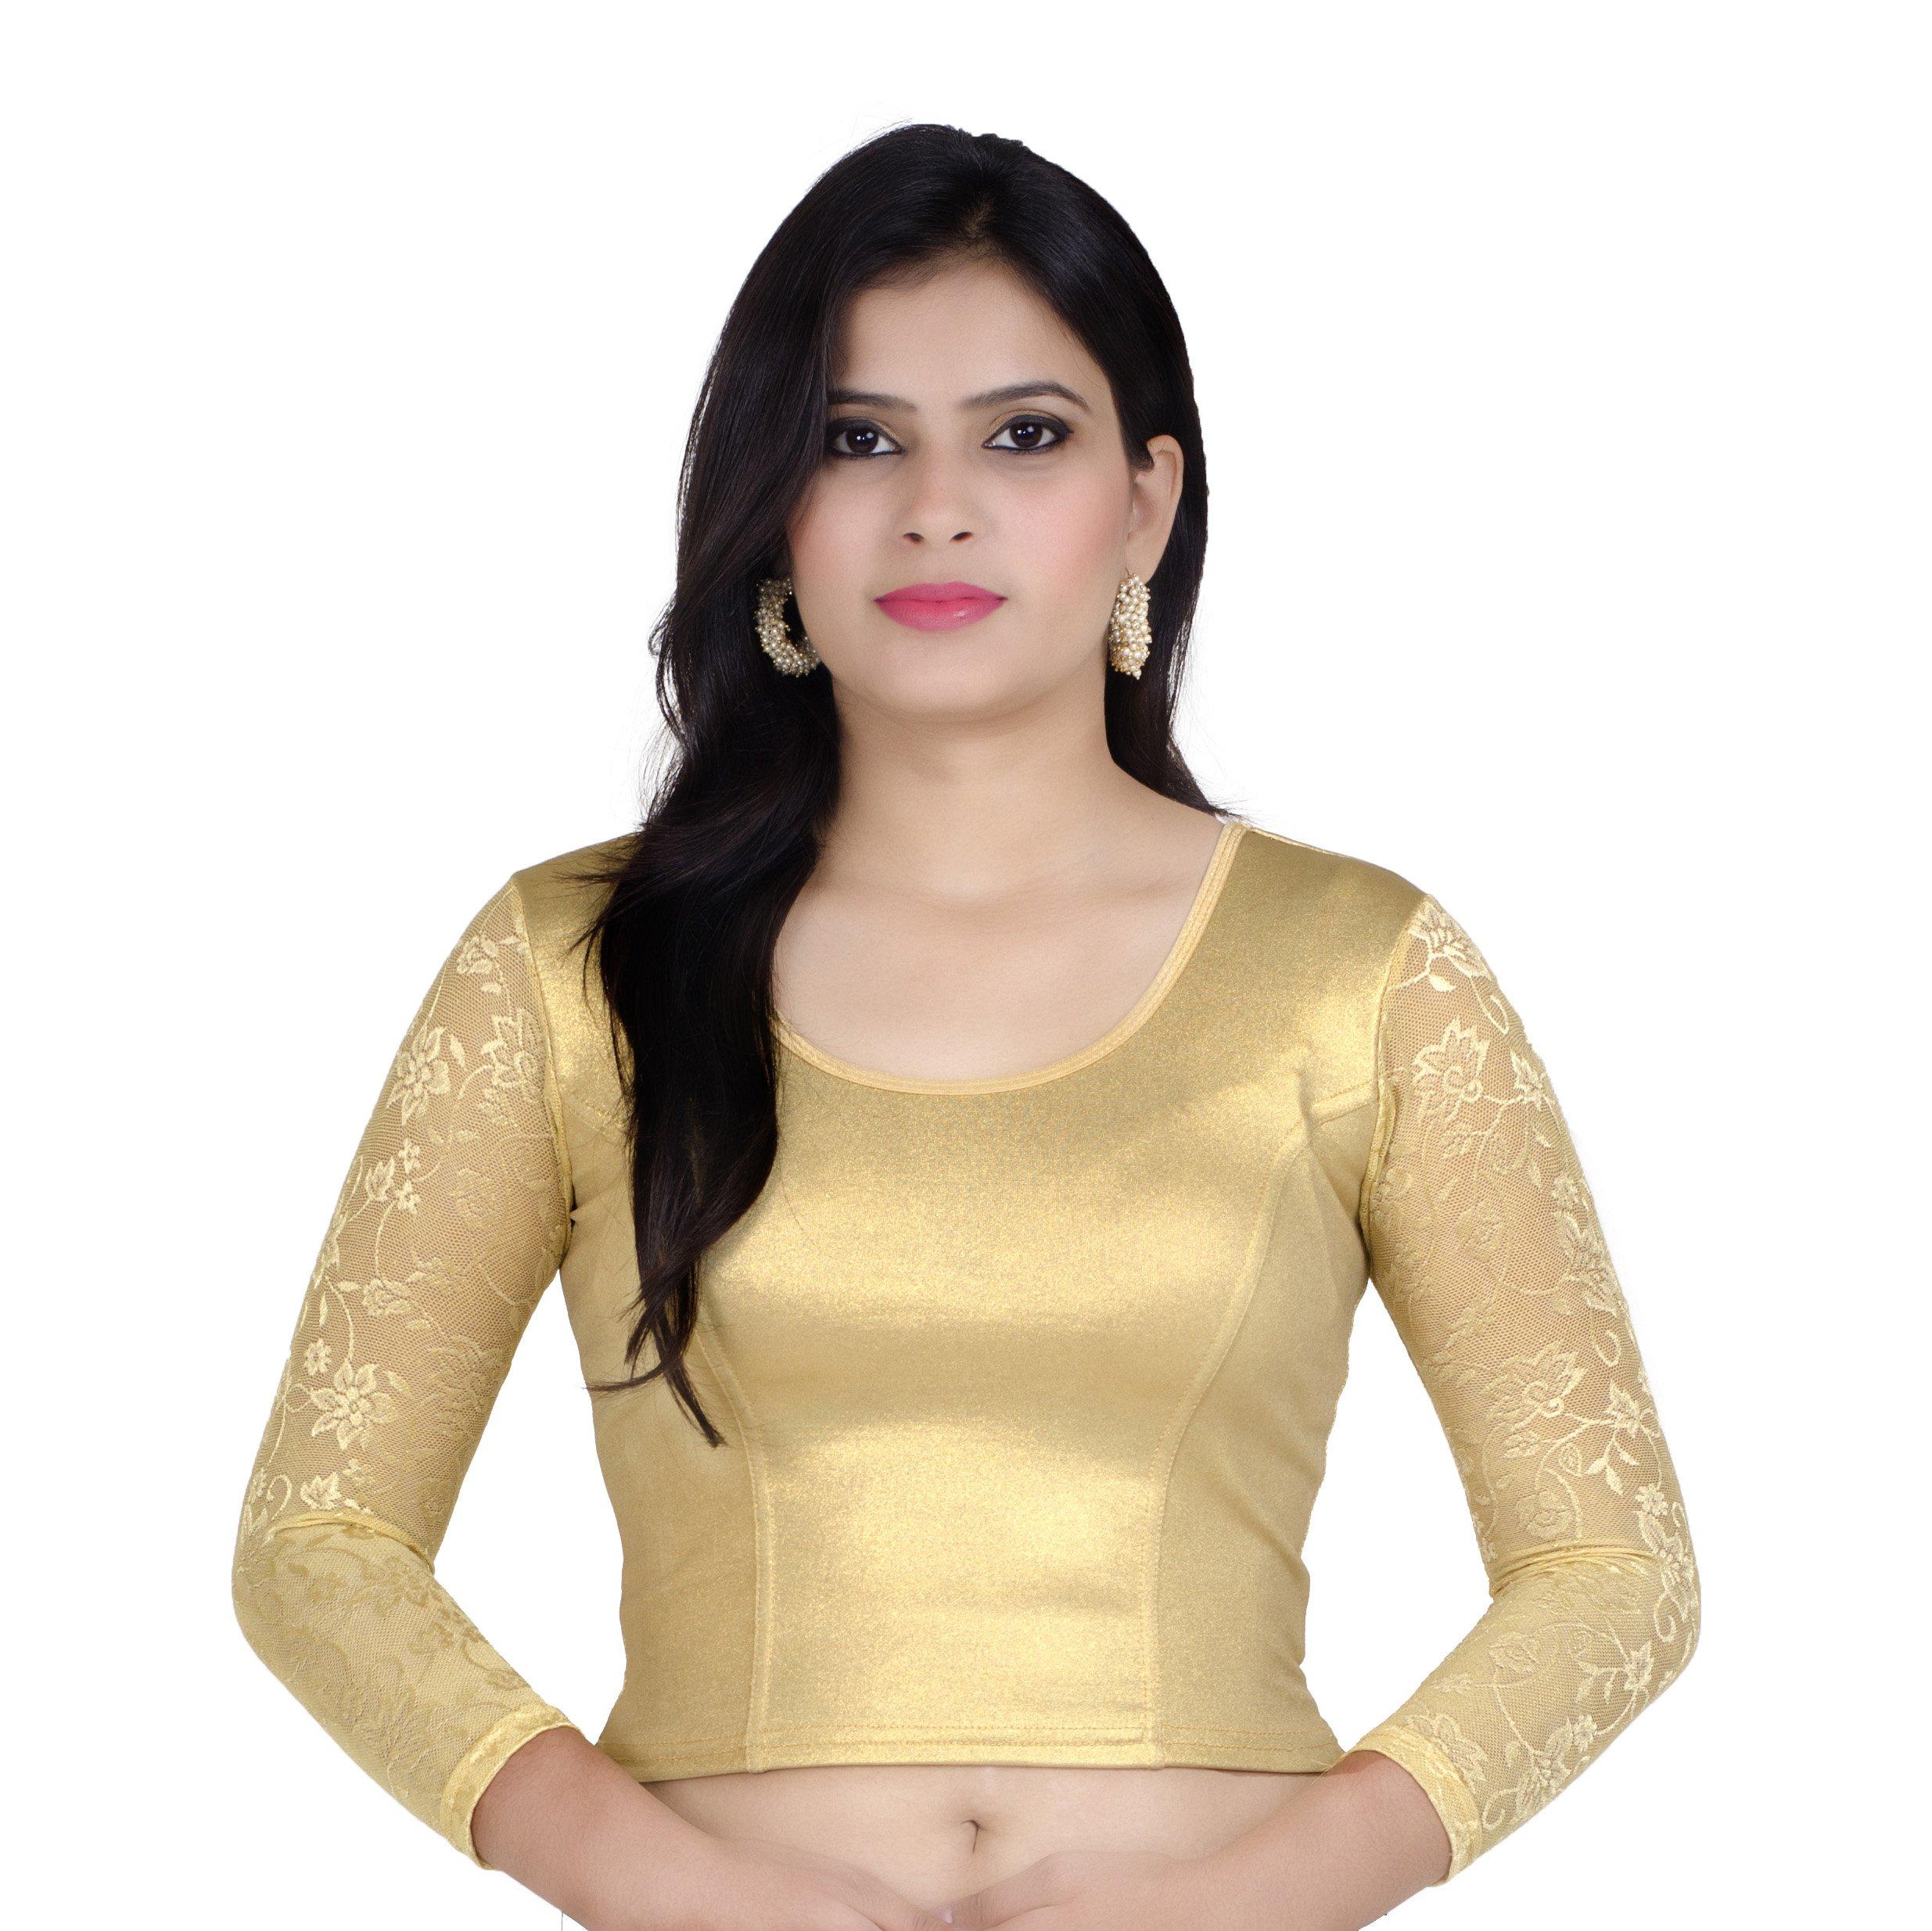 Chandrakala Women's Stretchable Readymade Gold Saree Blouse Crop Top Choli (B101GOL) by Chandrakala